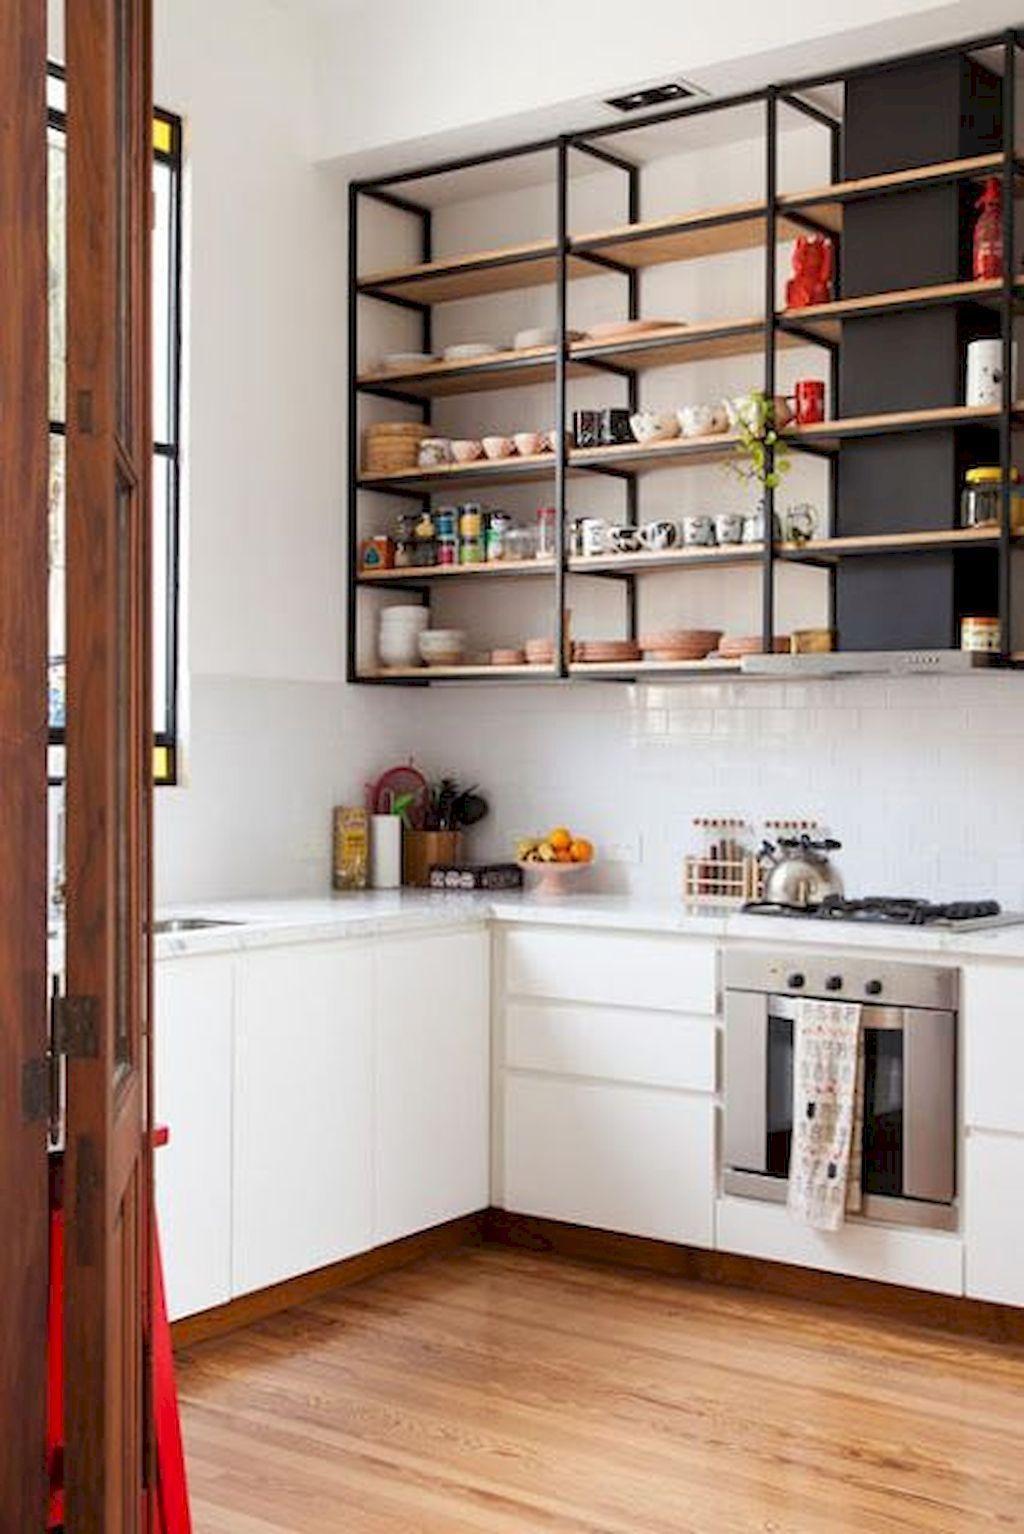 80 farmhouse open shelves kitchen decor ideas setyouroom com open shelves kitchen decor on farmhouse kitchen open shelves id=74708